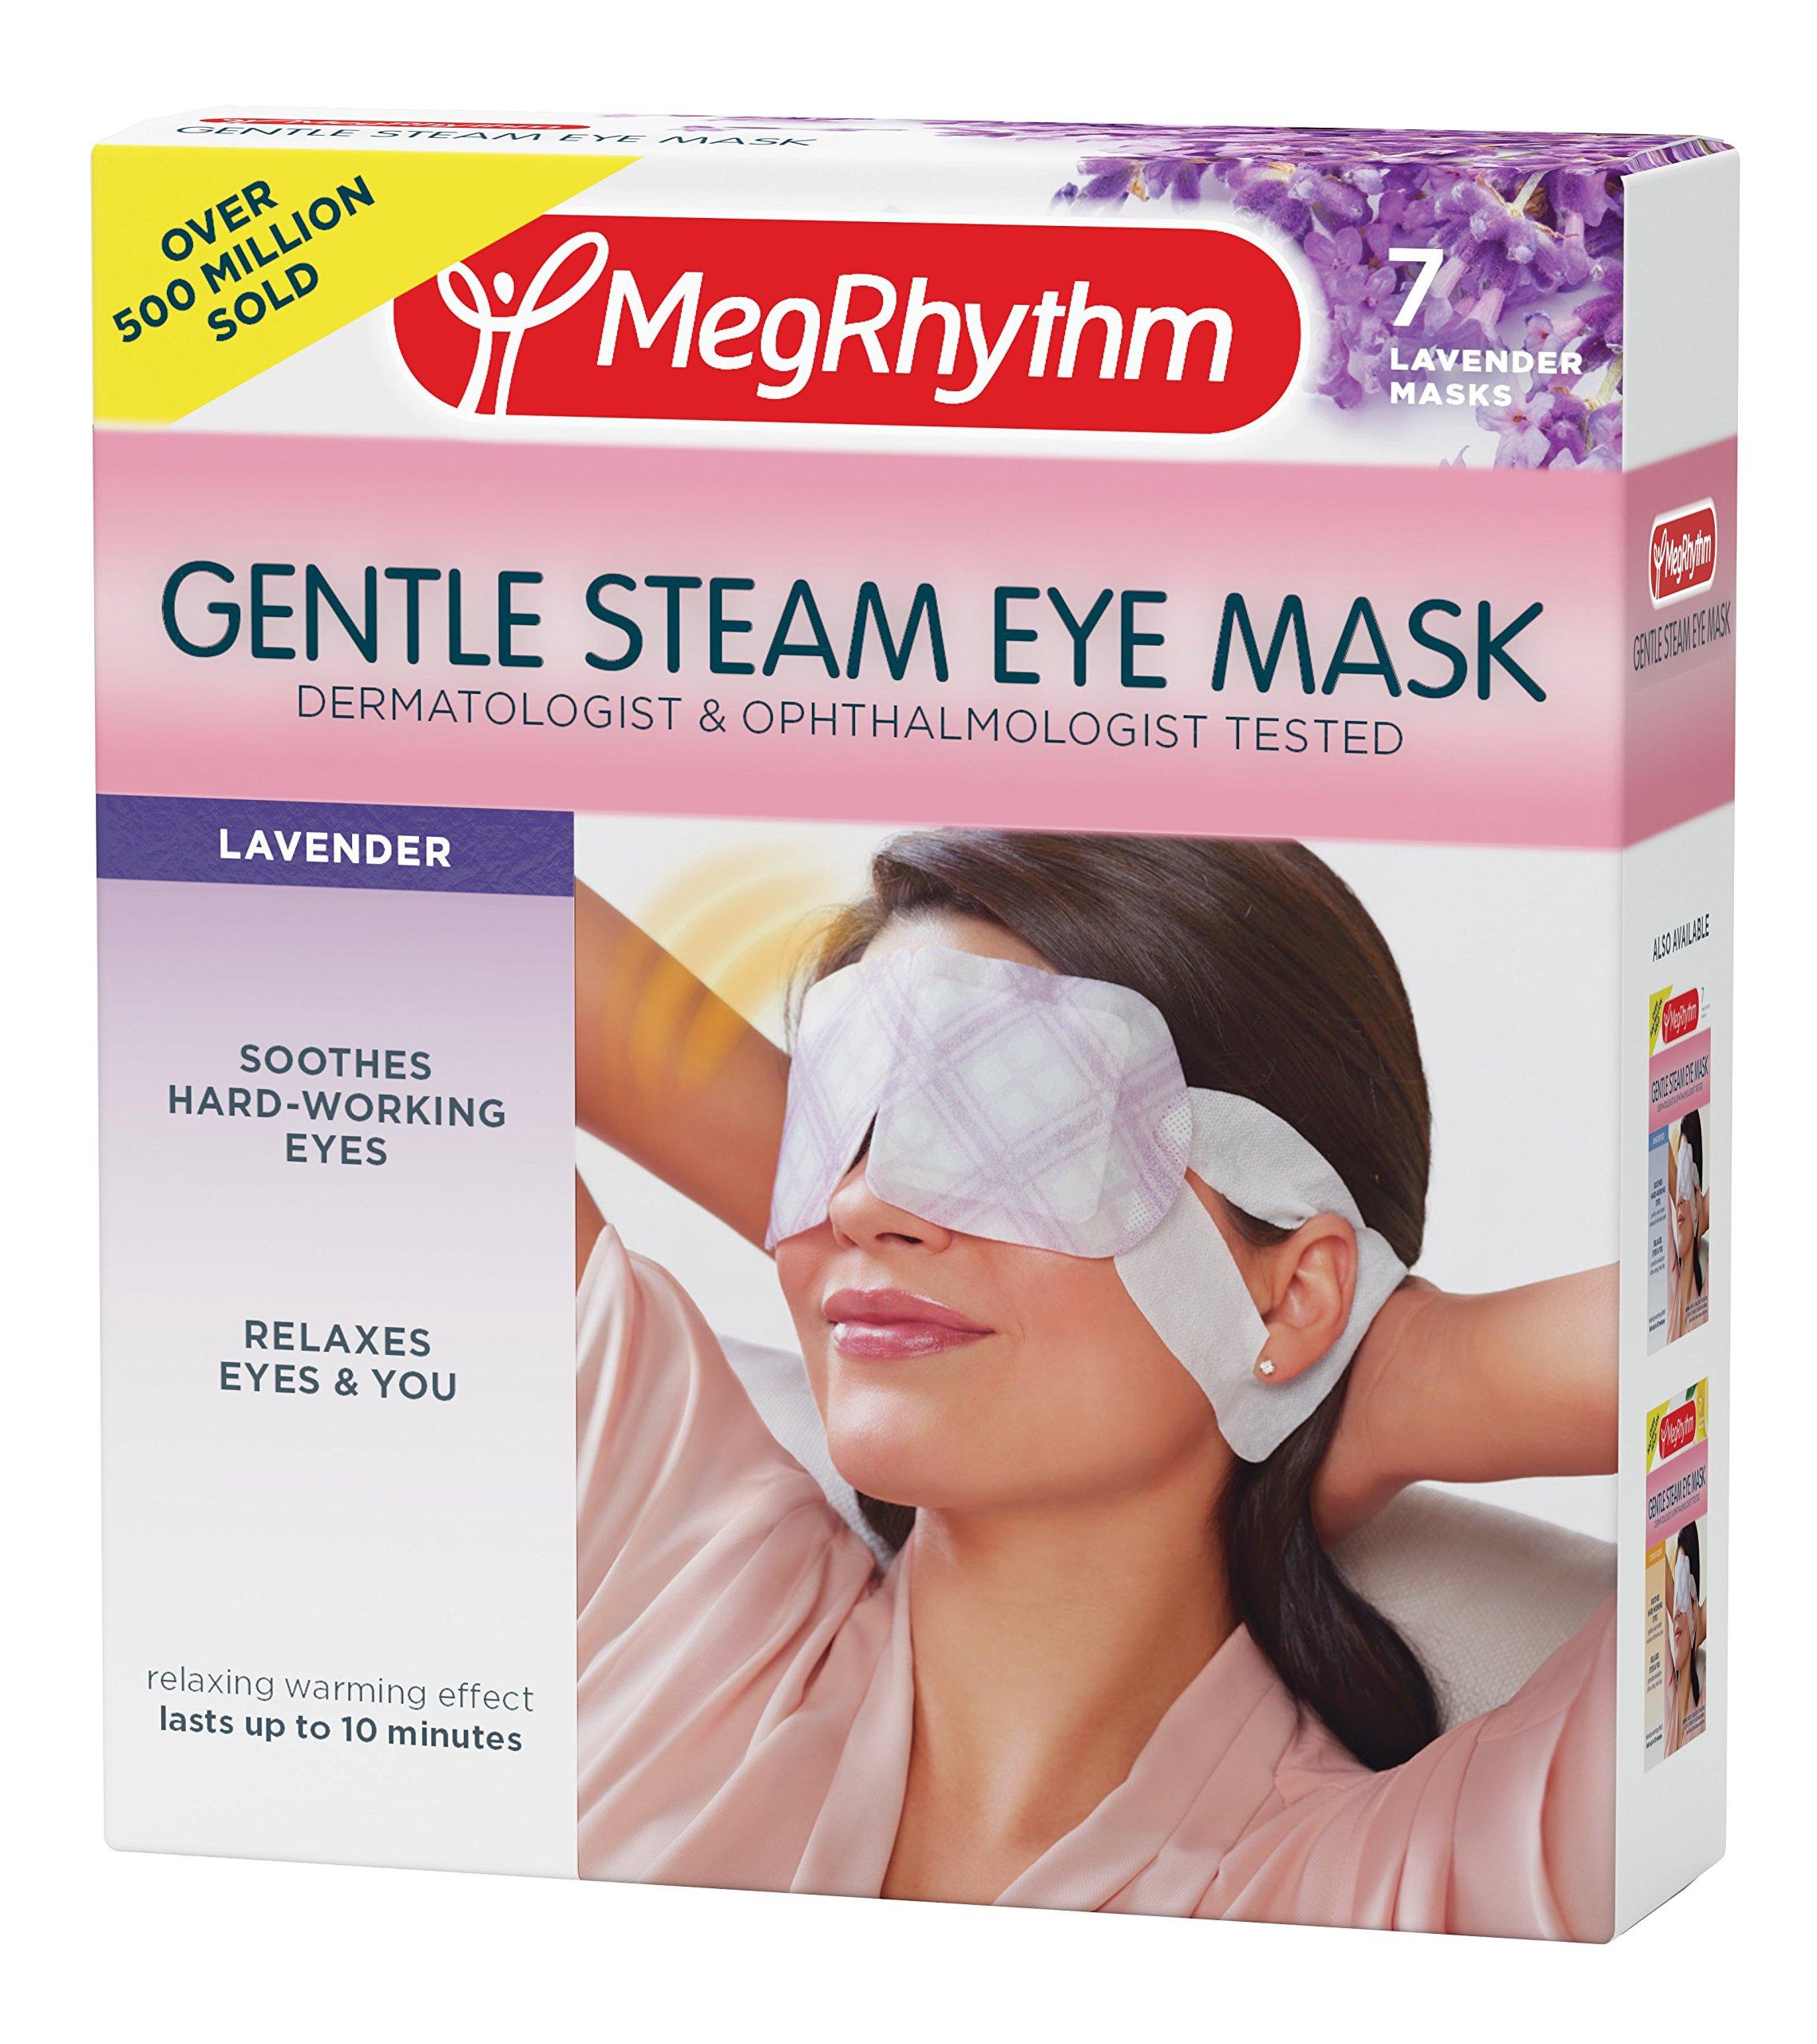 MegRhythm Gentle Steam Eye Mask, Lavender, 7 Count by MegRhythm